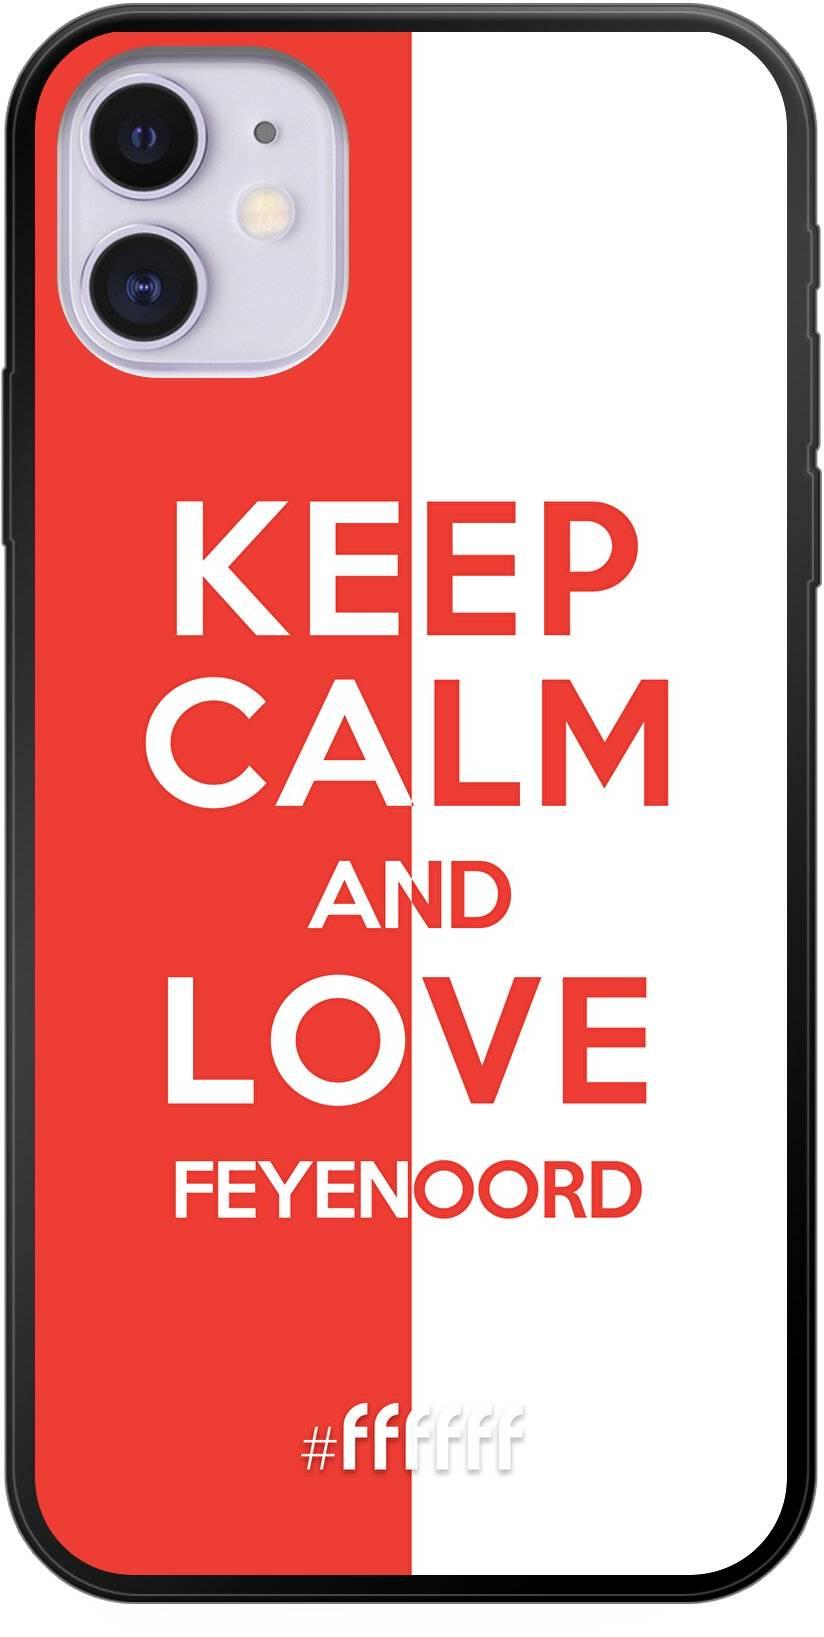 Feyenoord - Keep calm iPhone 11